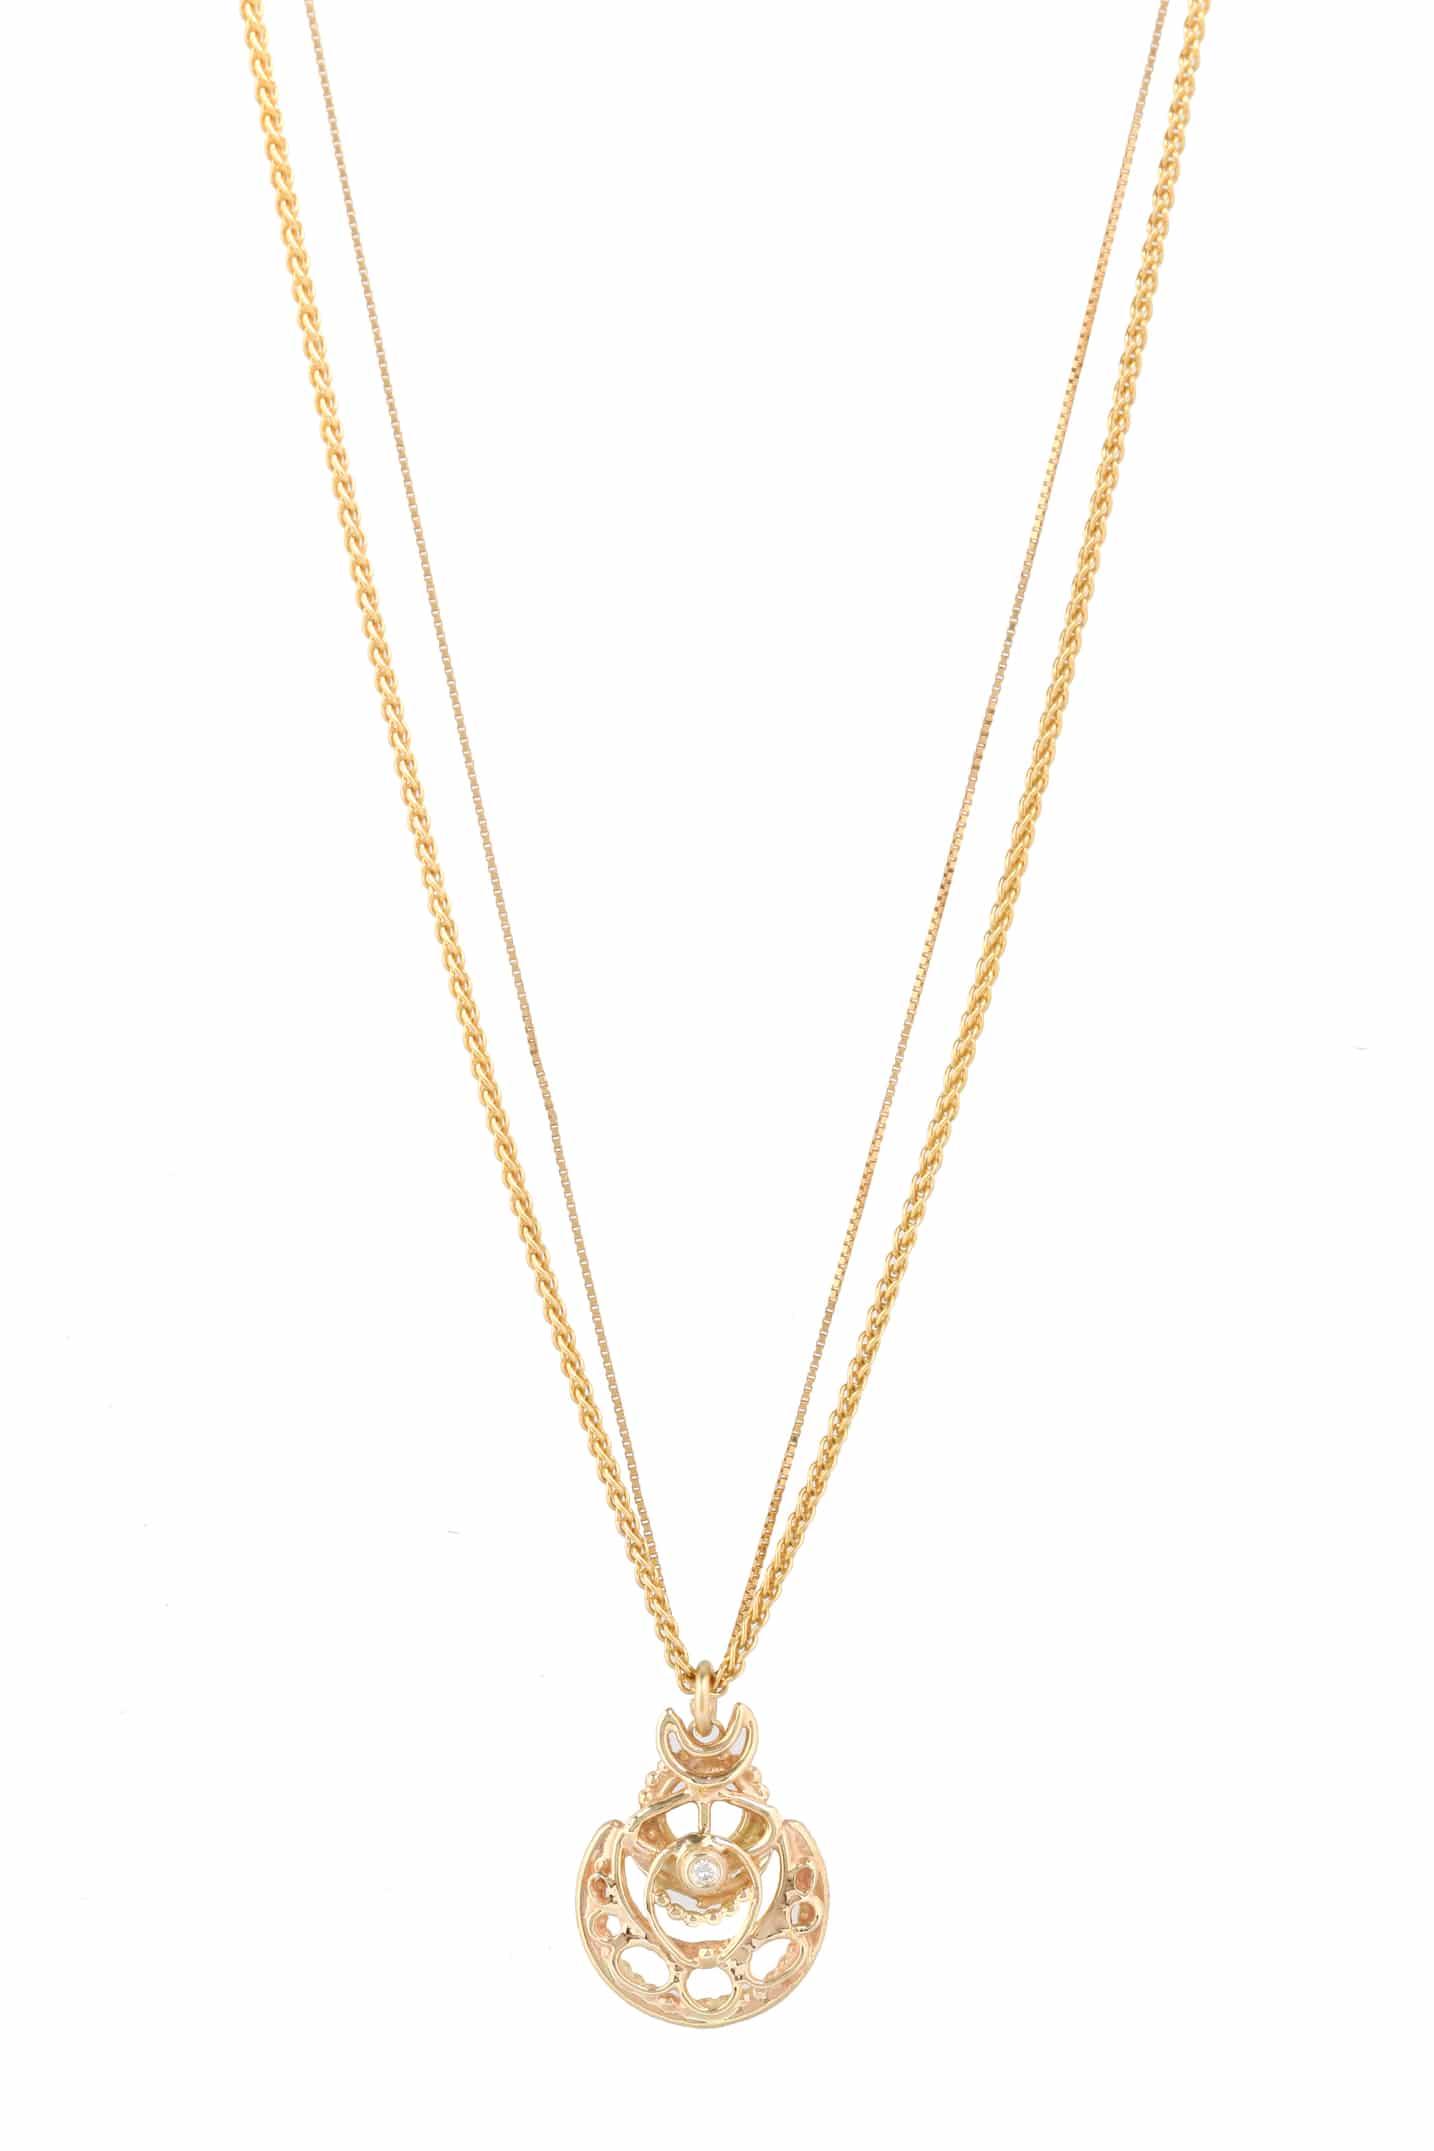 14kt gold, 2mm white diamond